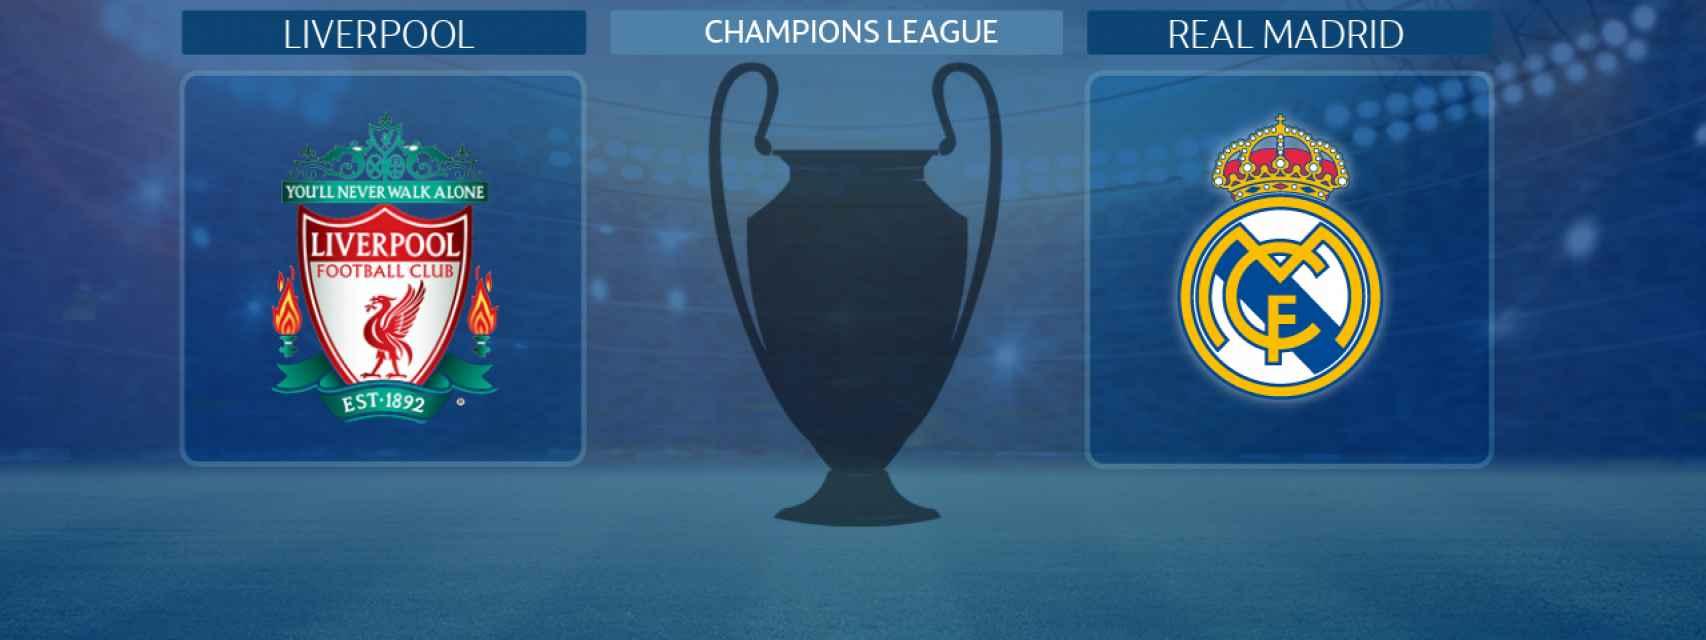 Liverpool - Real Madrid, partido de la Champions League